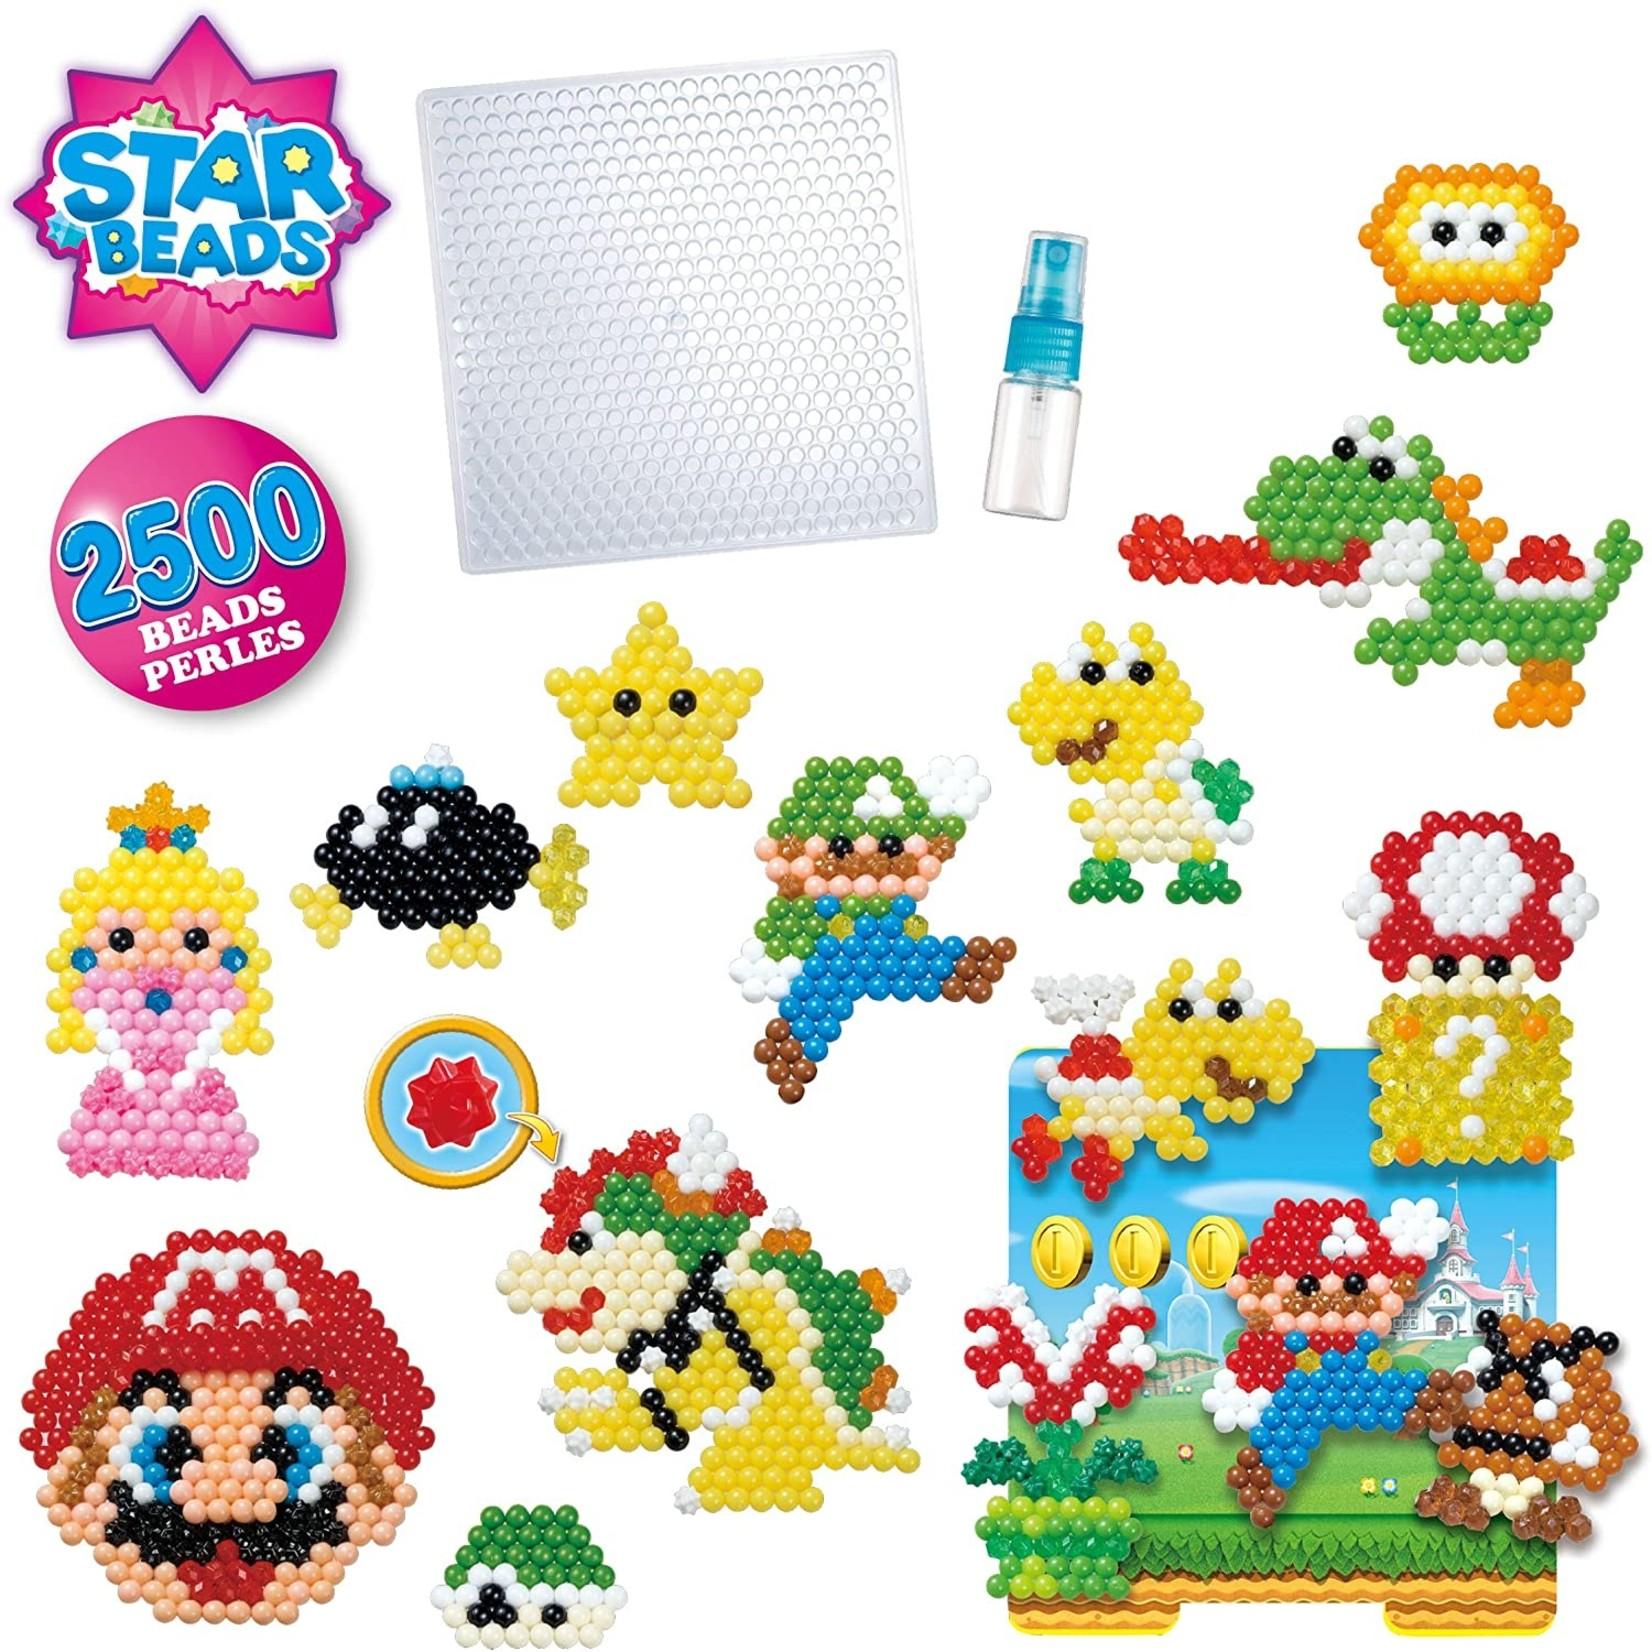 Super Mario box